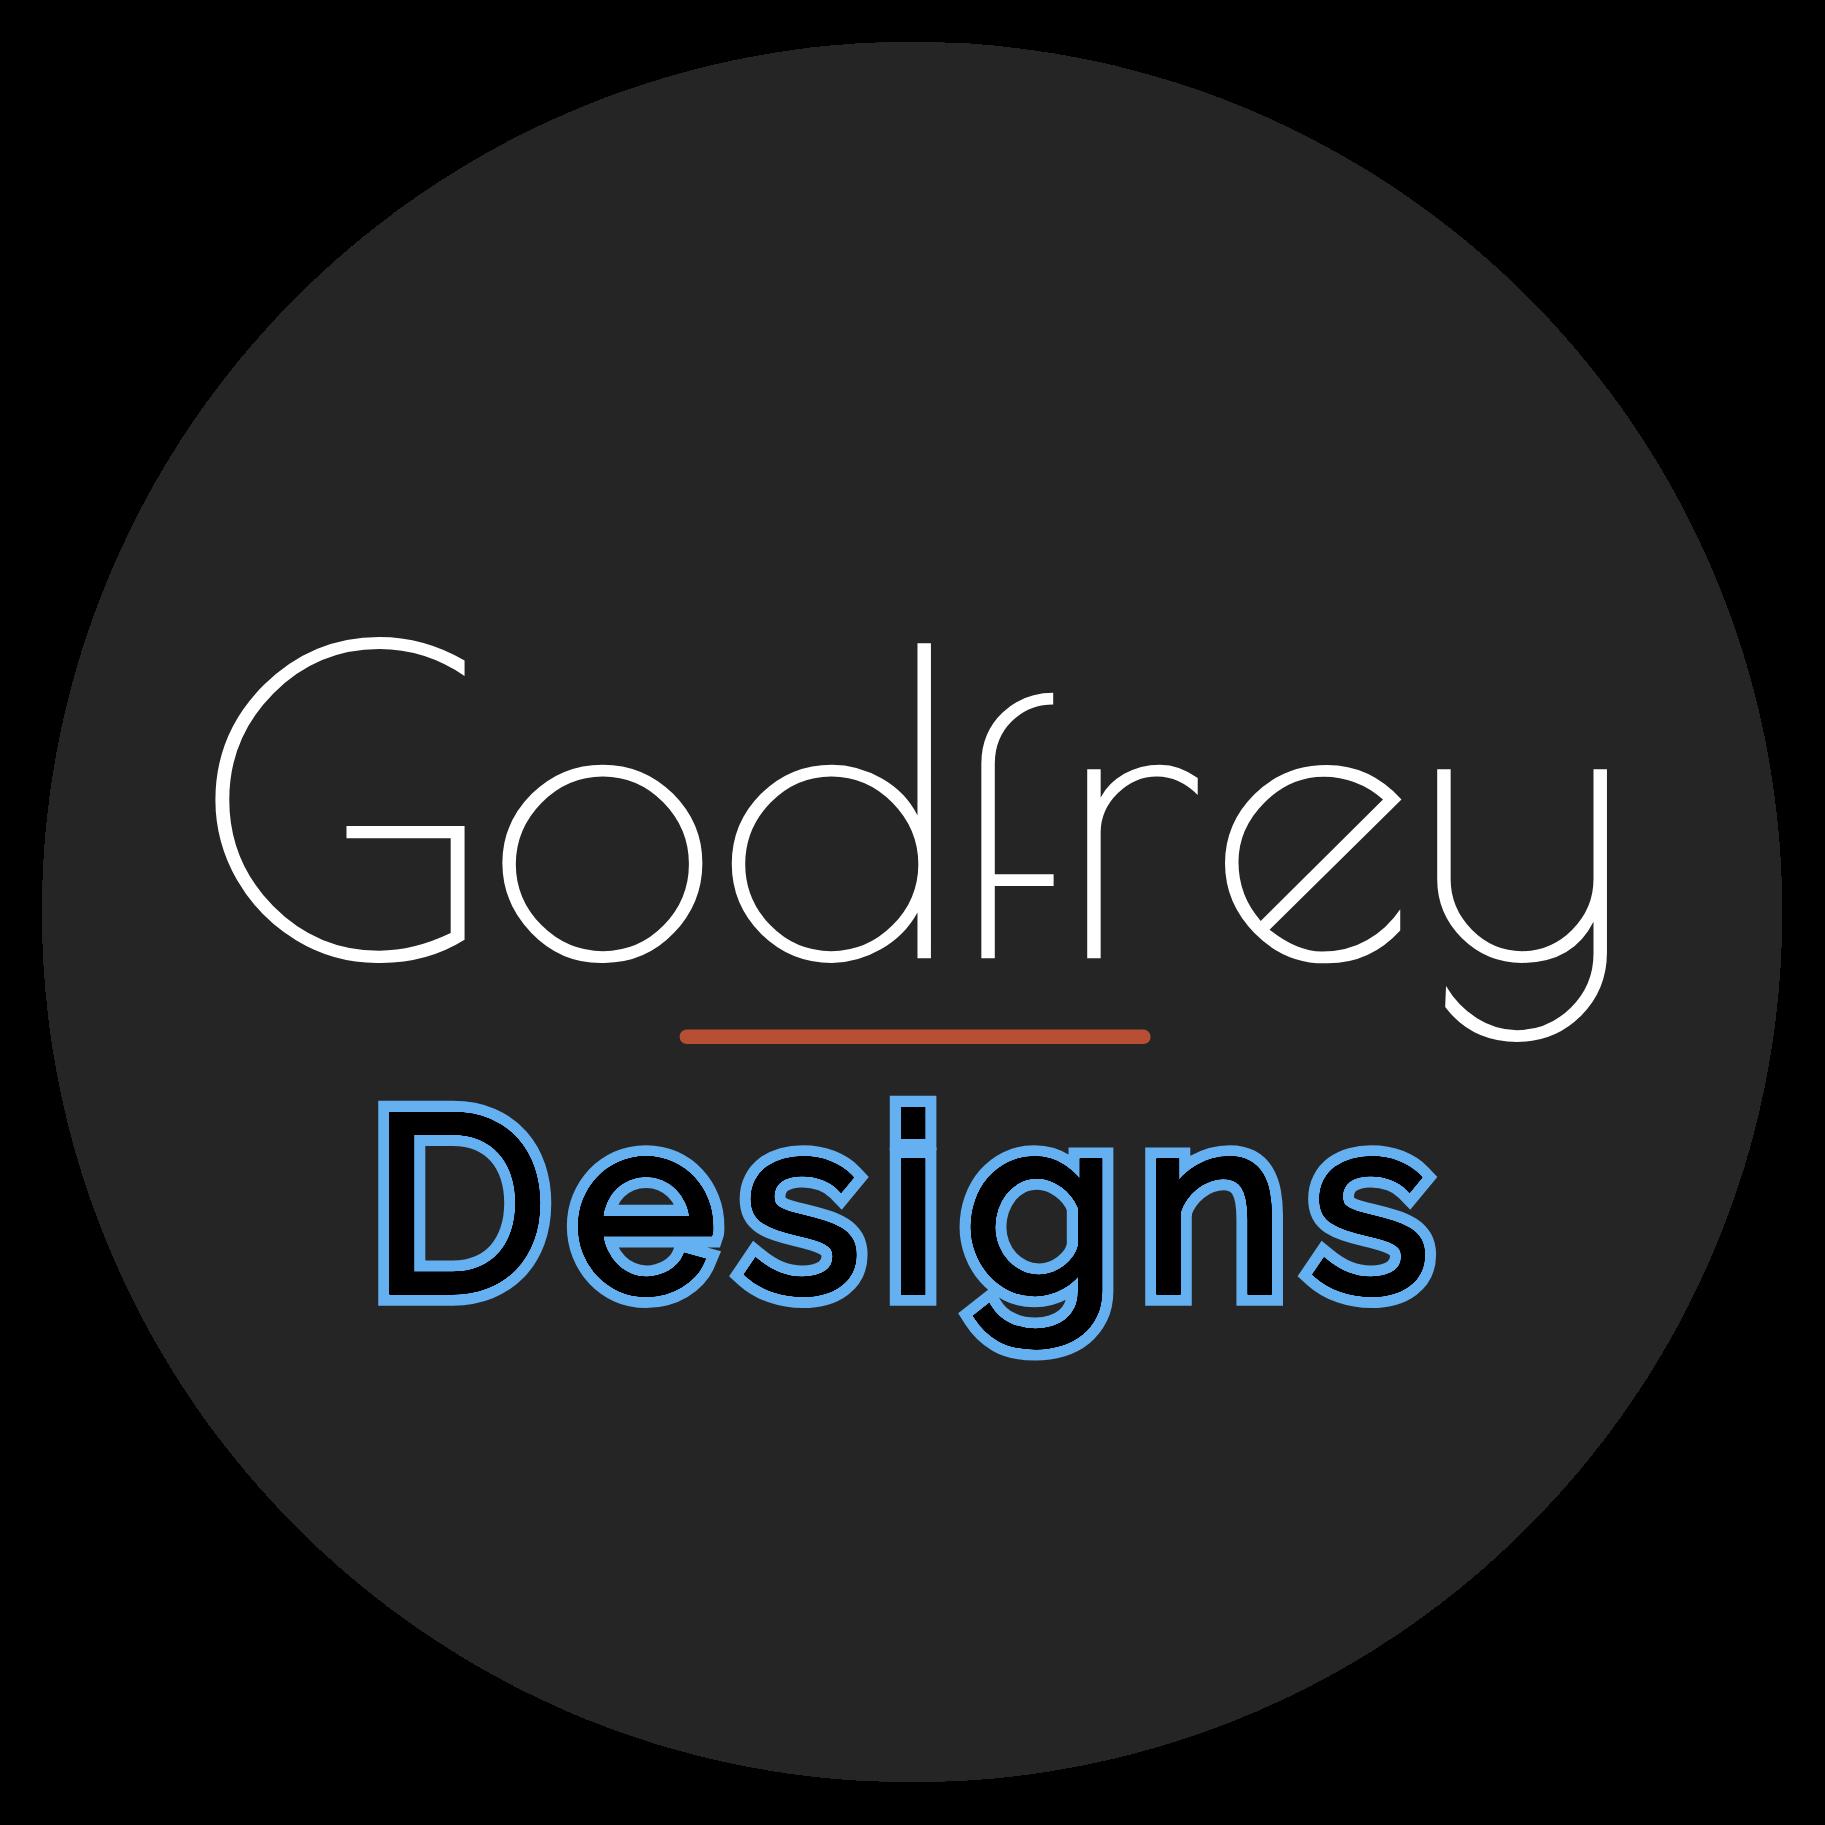 Godfrey Designs